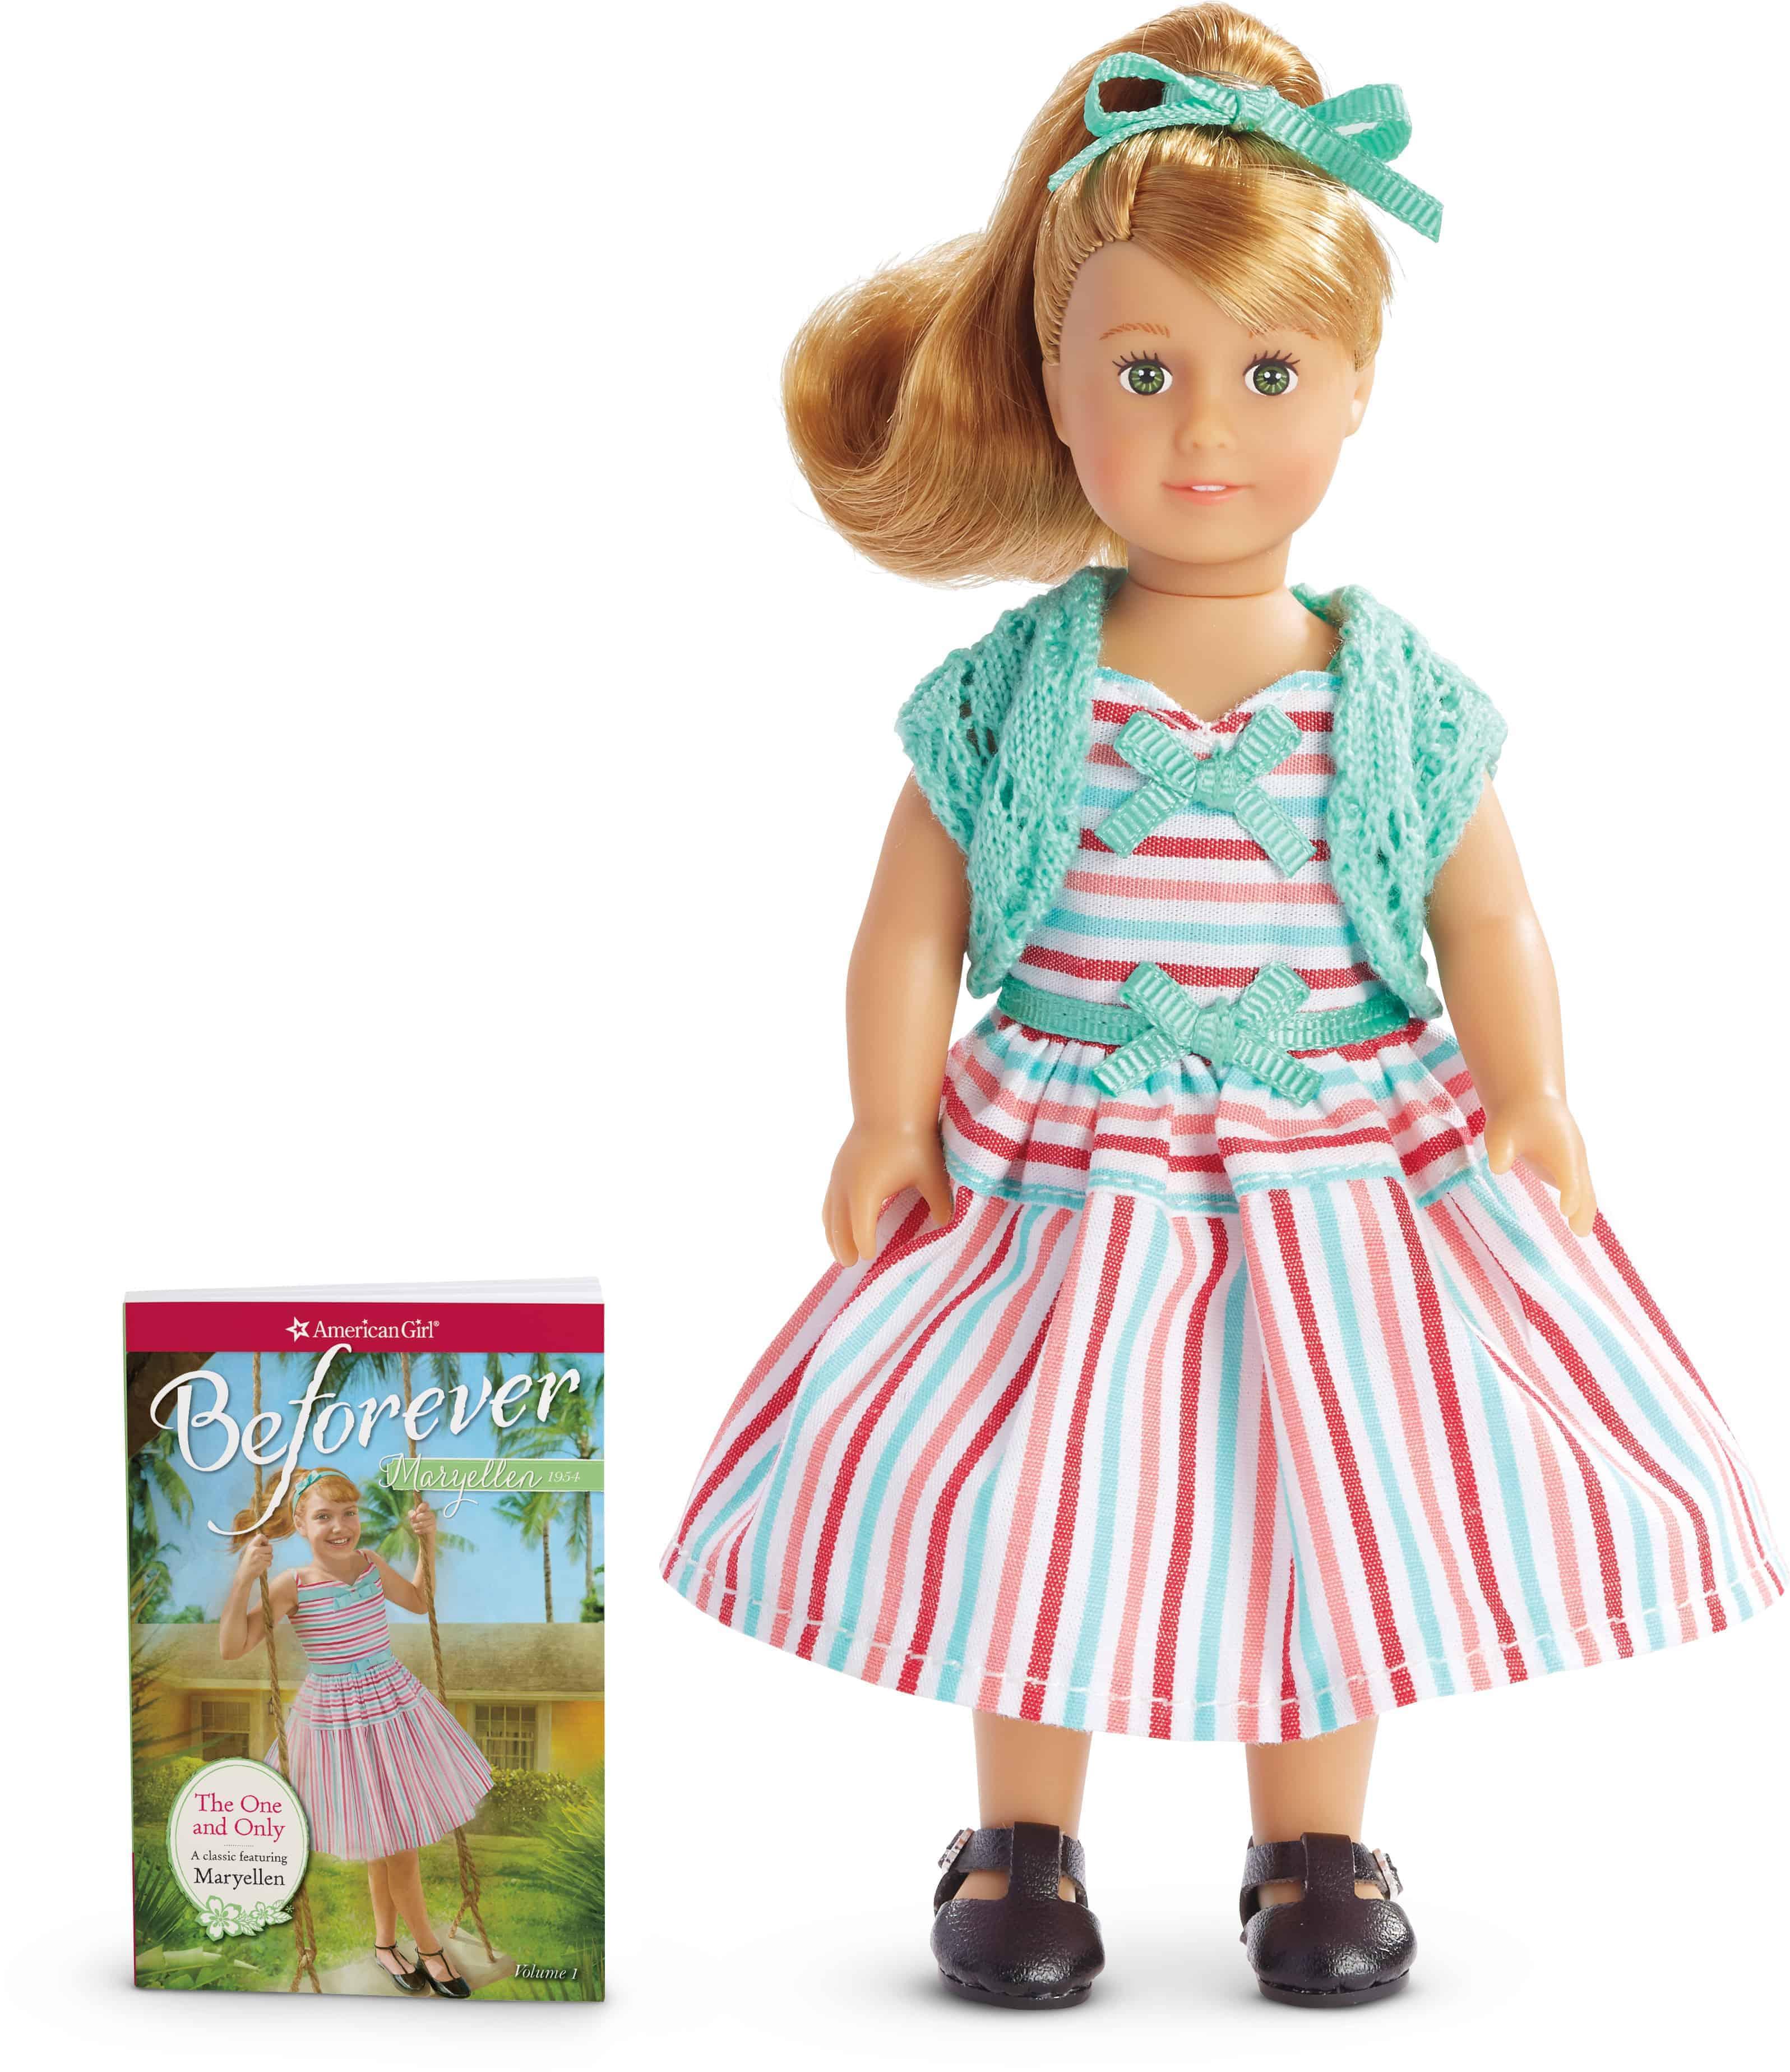 Mary Ellen Larkin Doll and Book